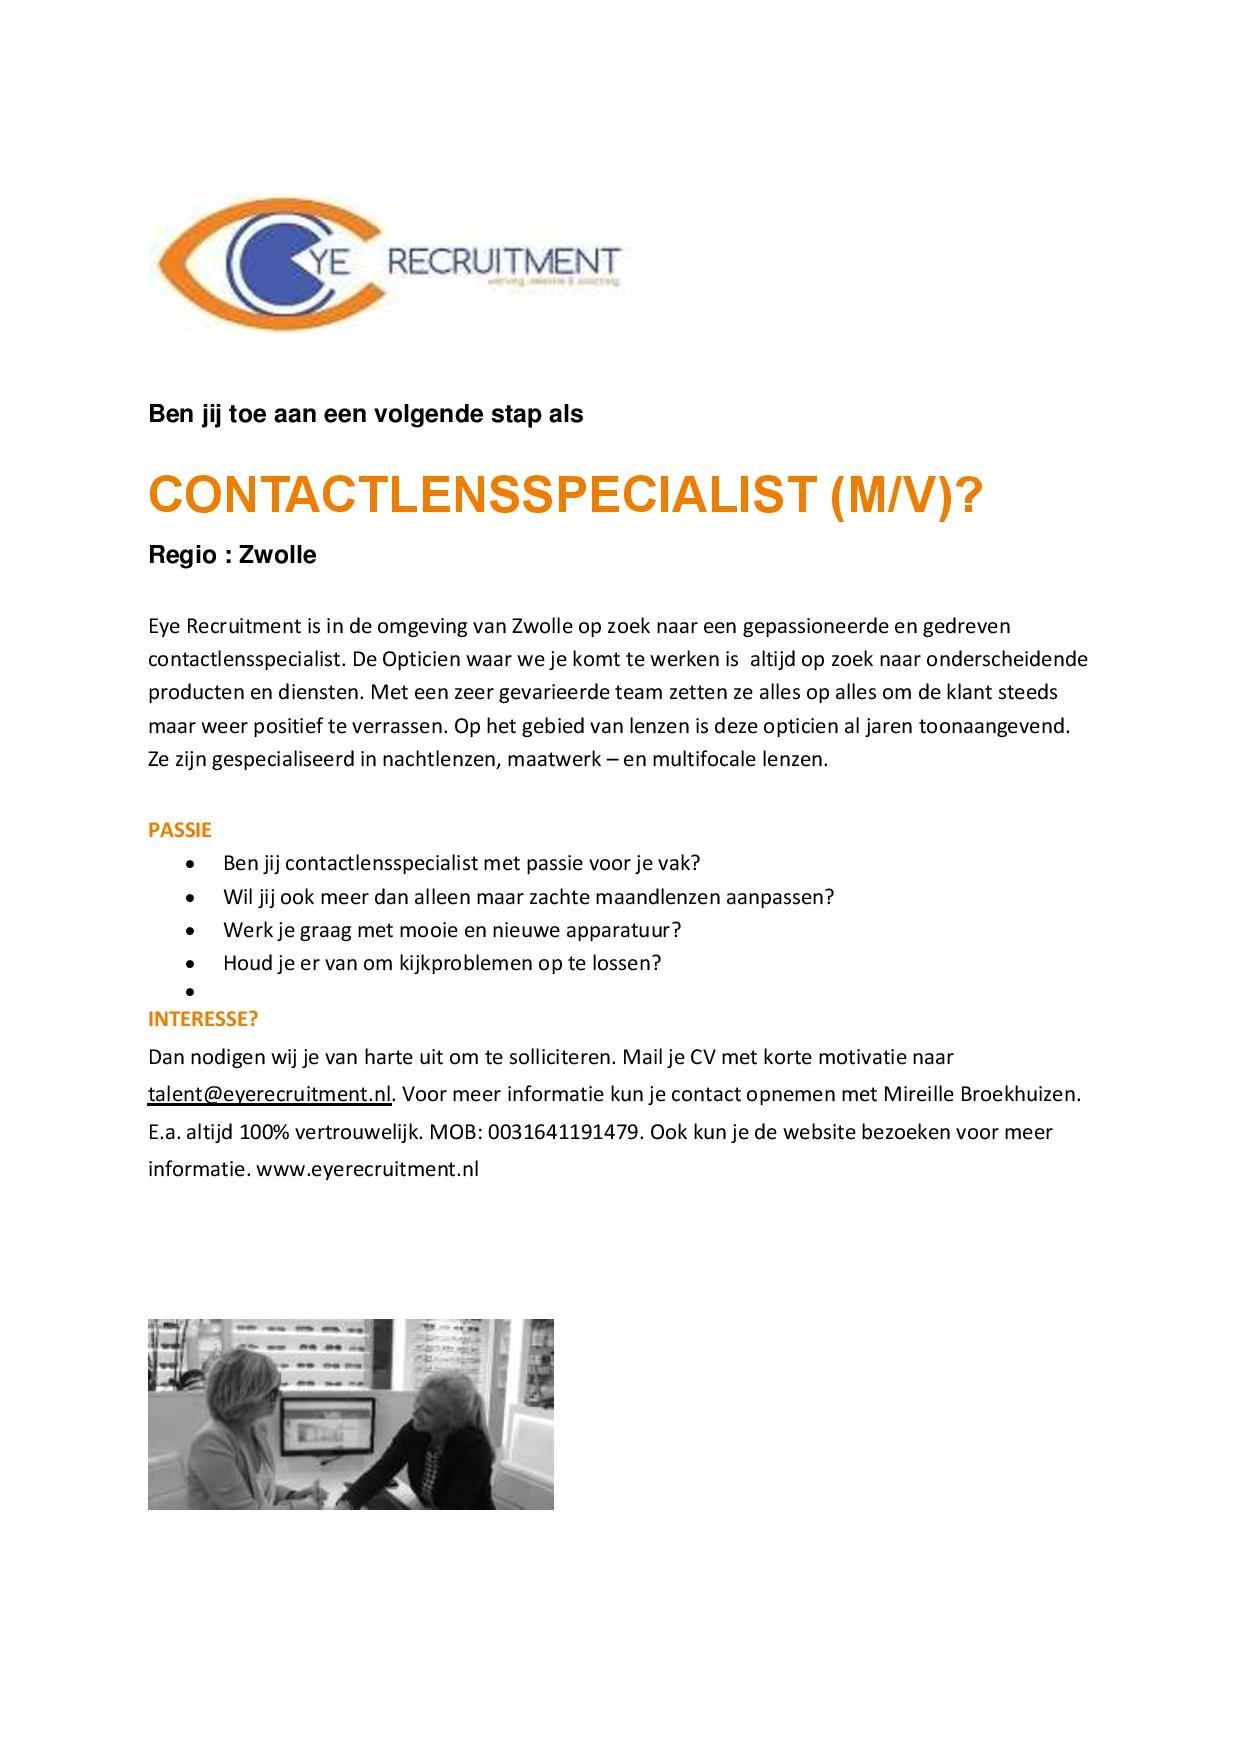 vacature-contactlensspecialist-jochem-page-001-1